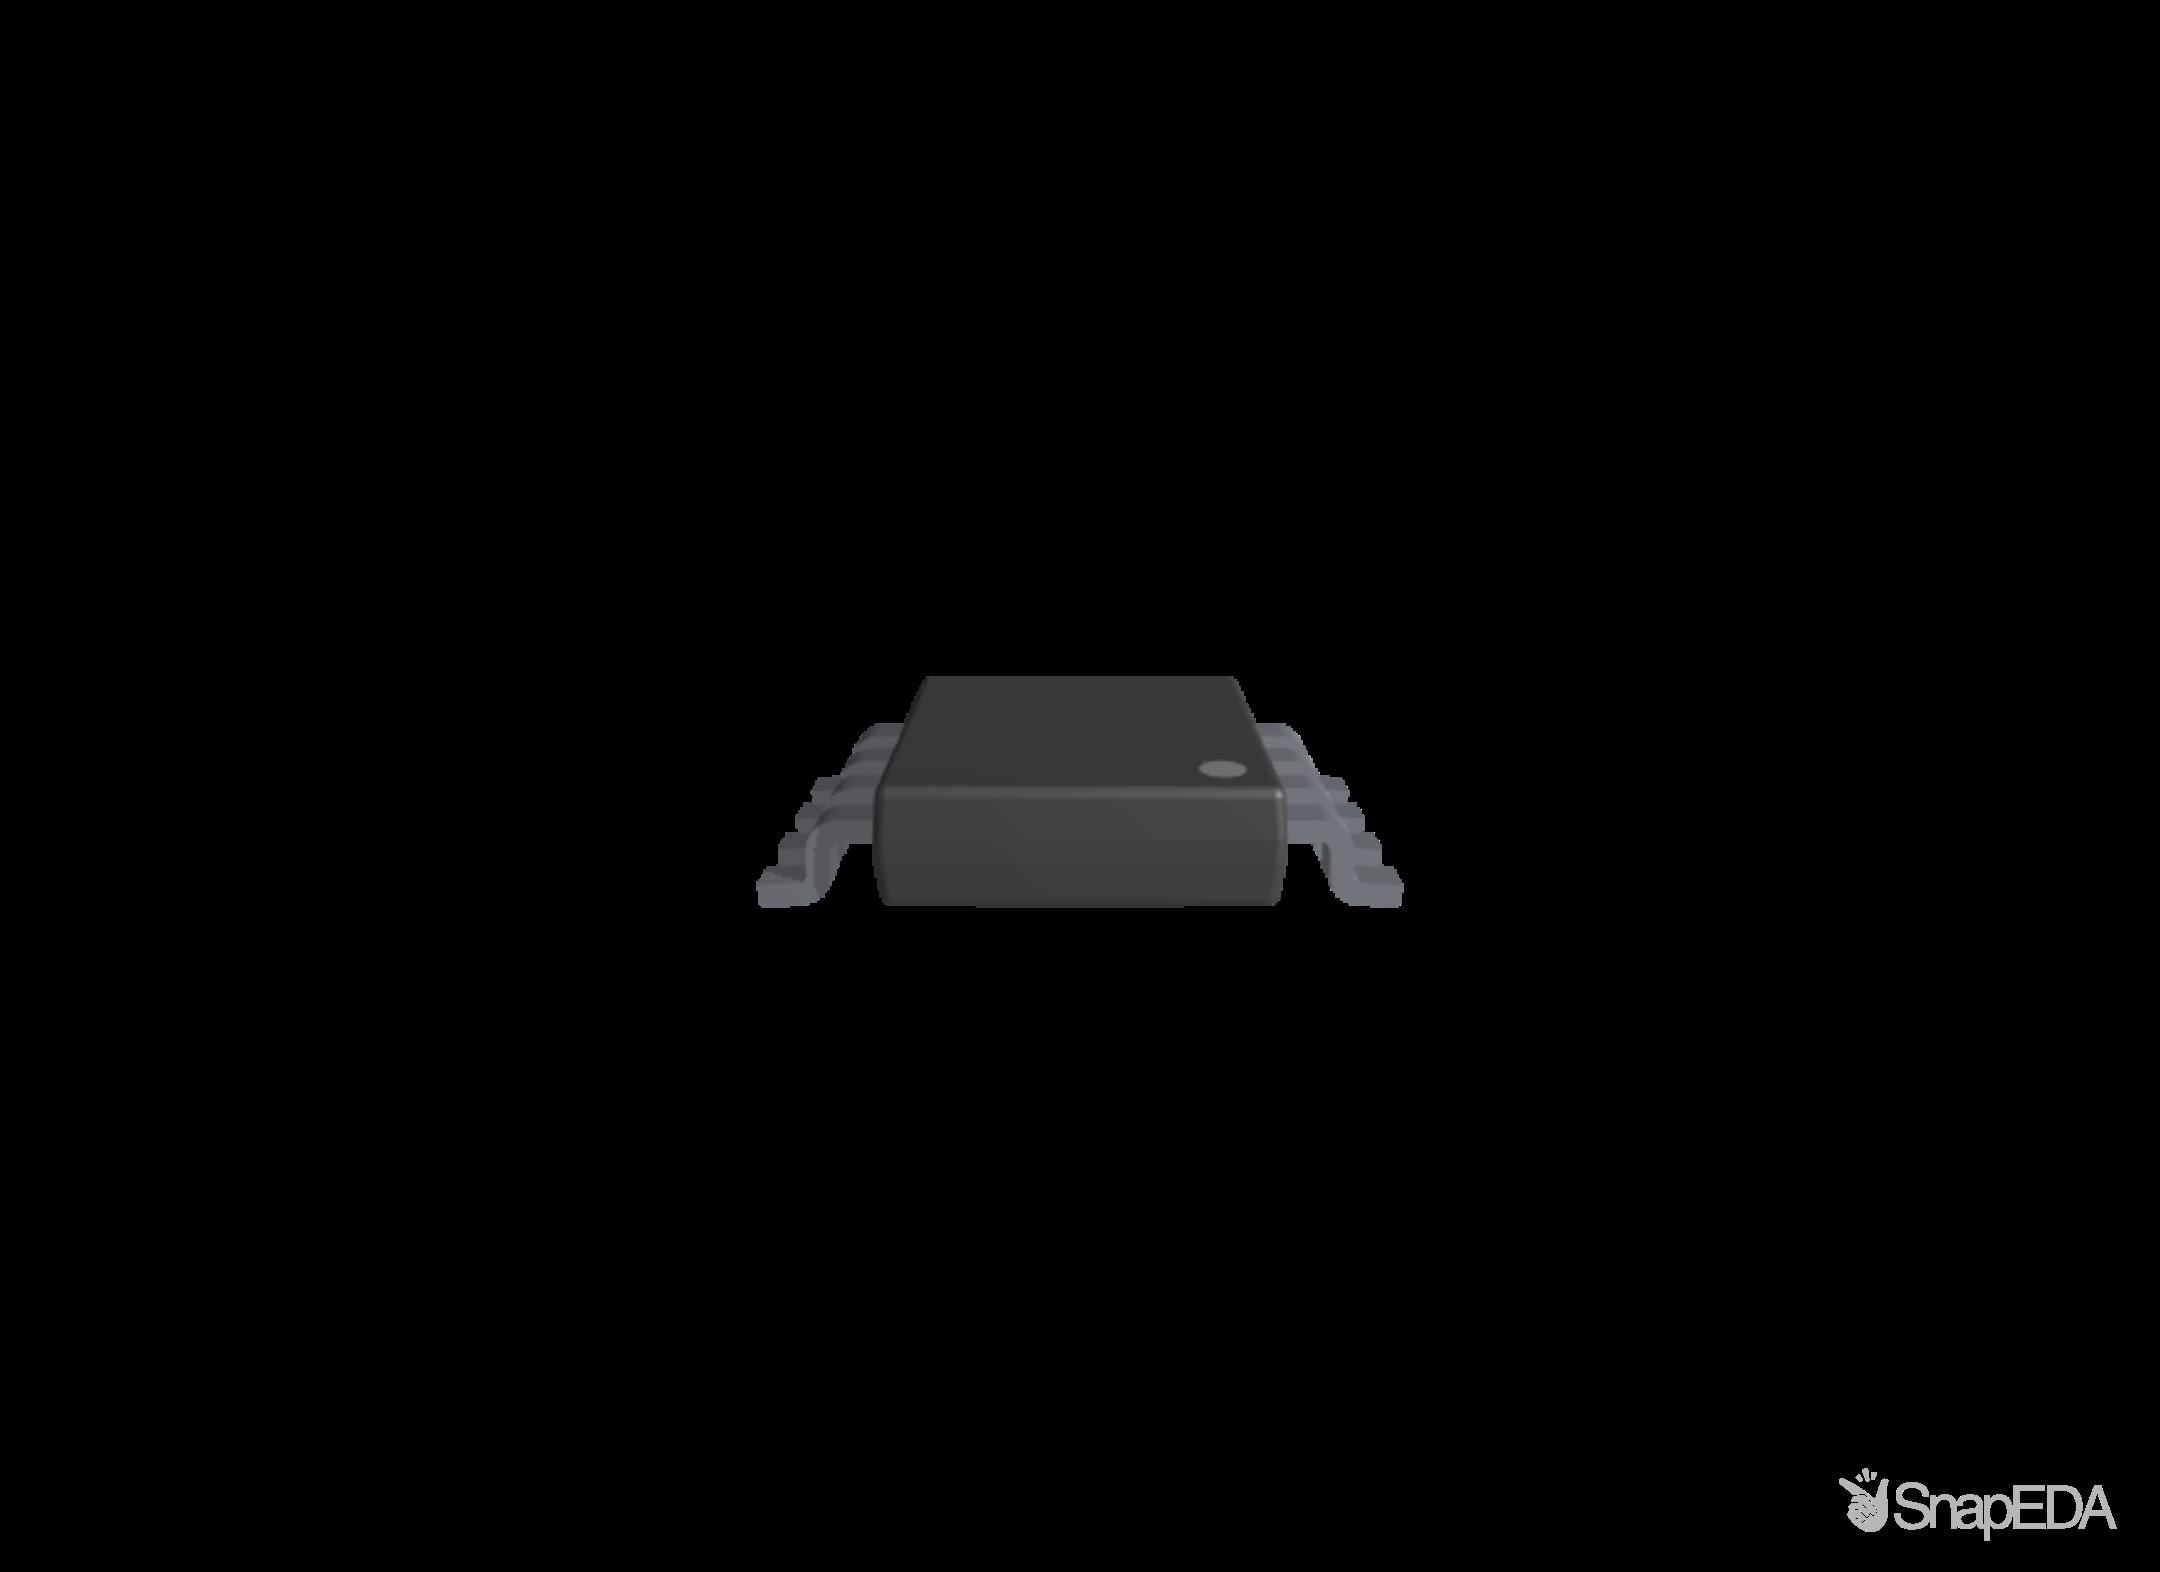 LM74610QDGKTQ1 3D Model